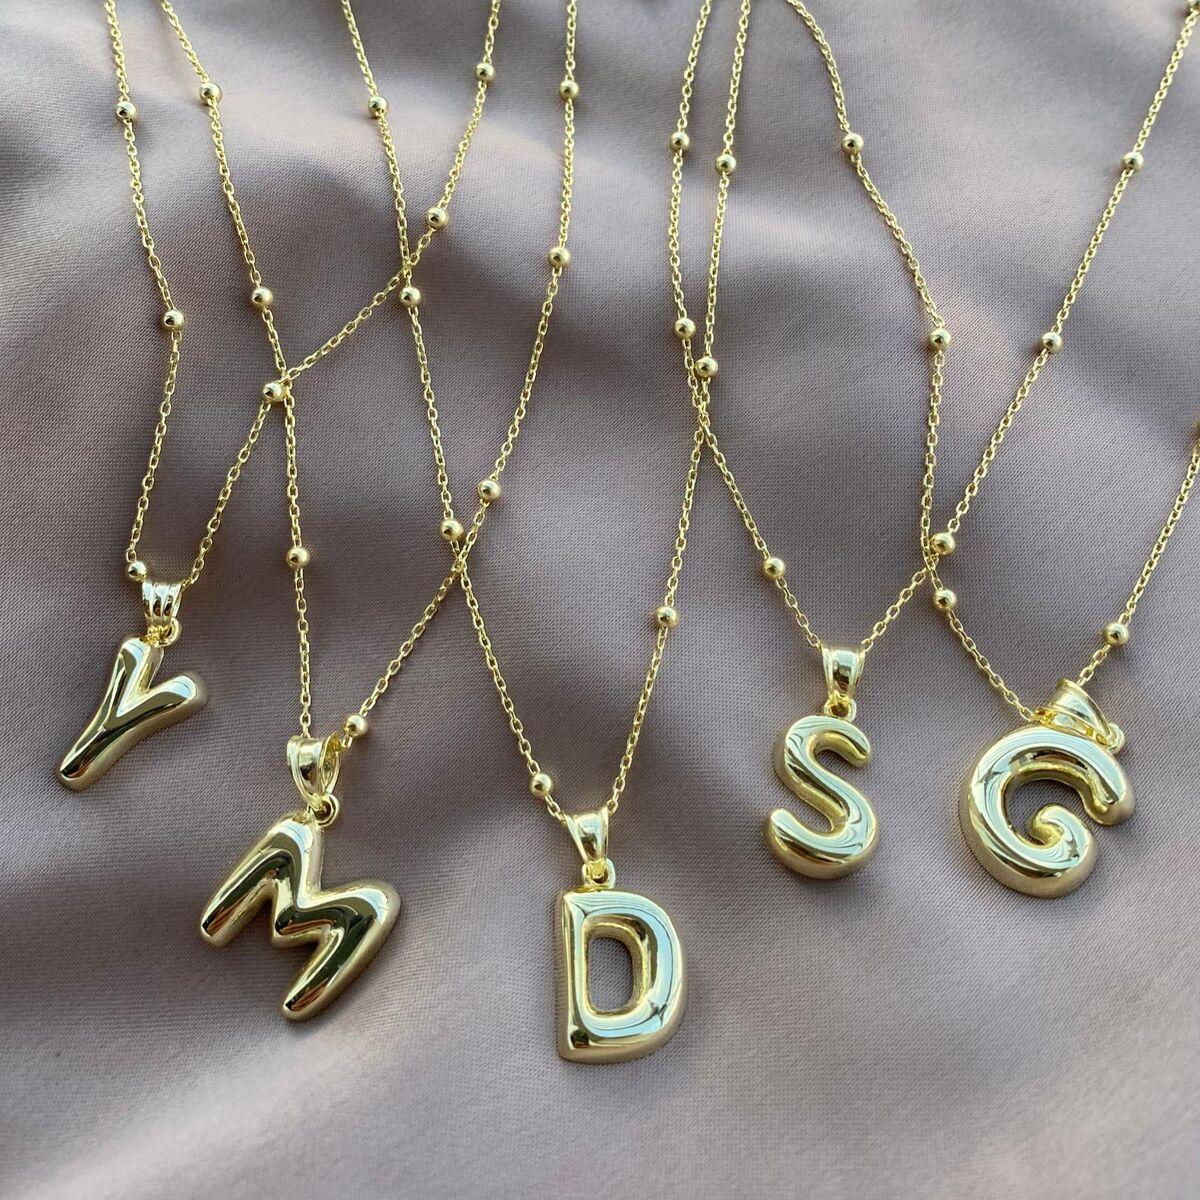 Top Zincirli Harf Kolye   925 Gümüş